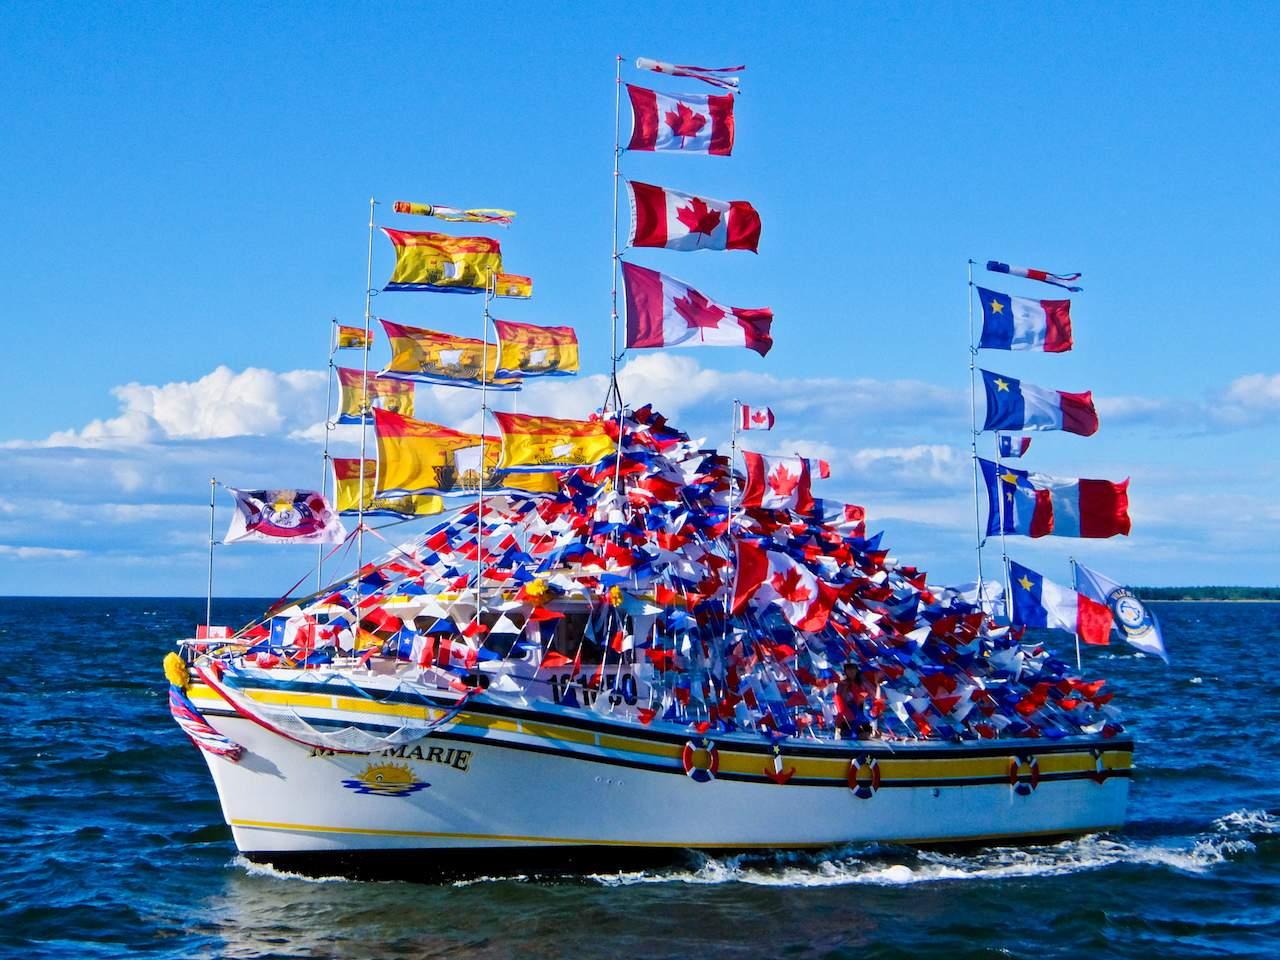 Caroquet Boat w Flags